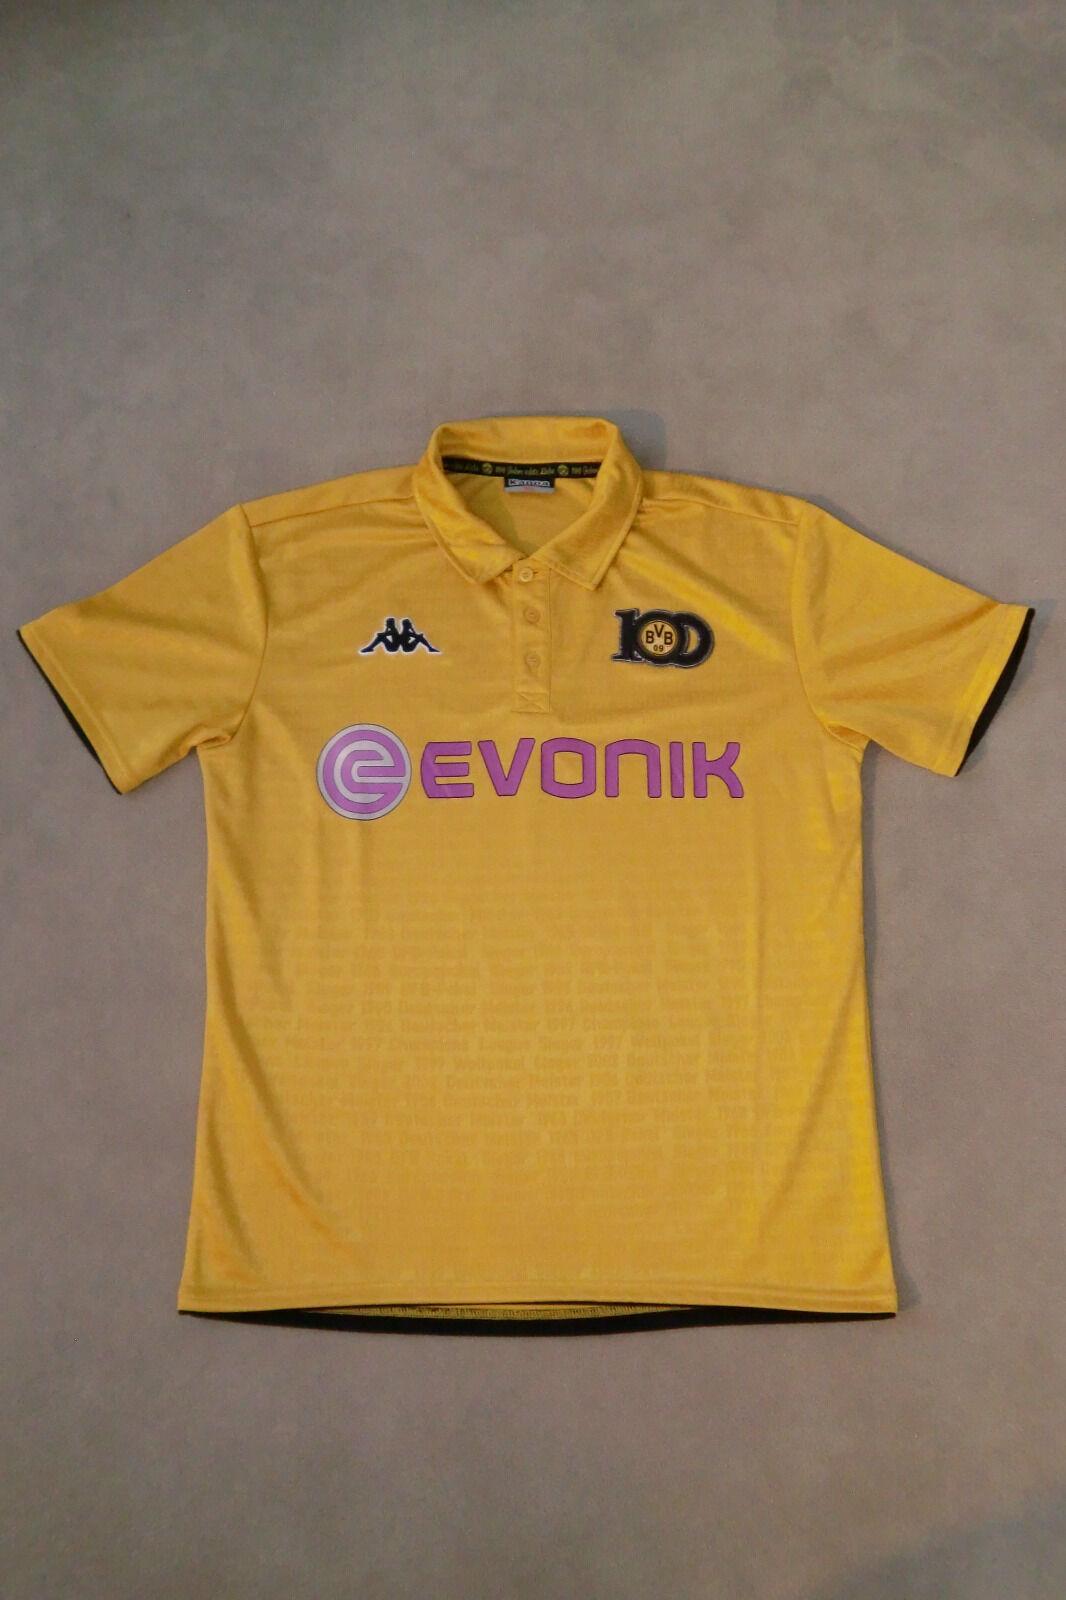 BVB Borussia Dortmund Trikot XL zum 100 jährigen Vereinsjubiläum (2009)